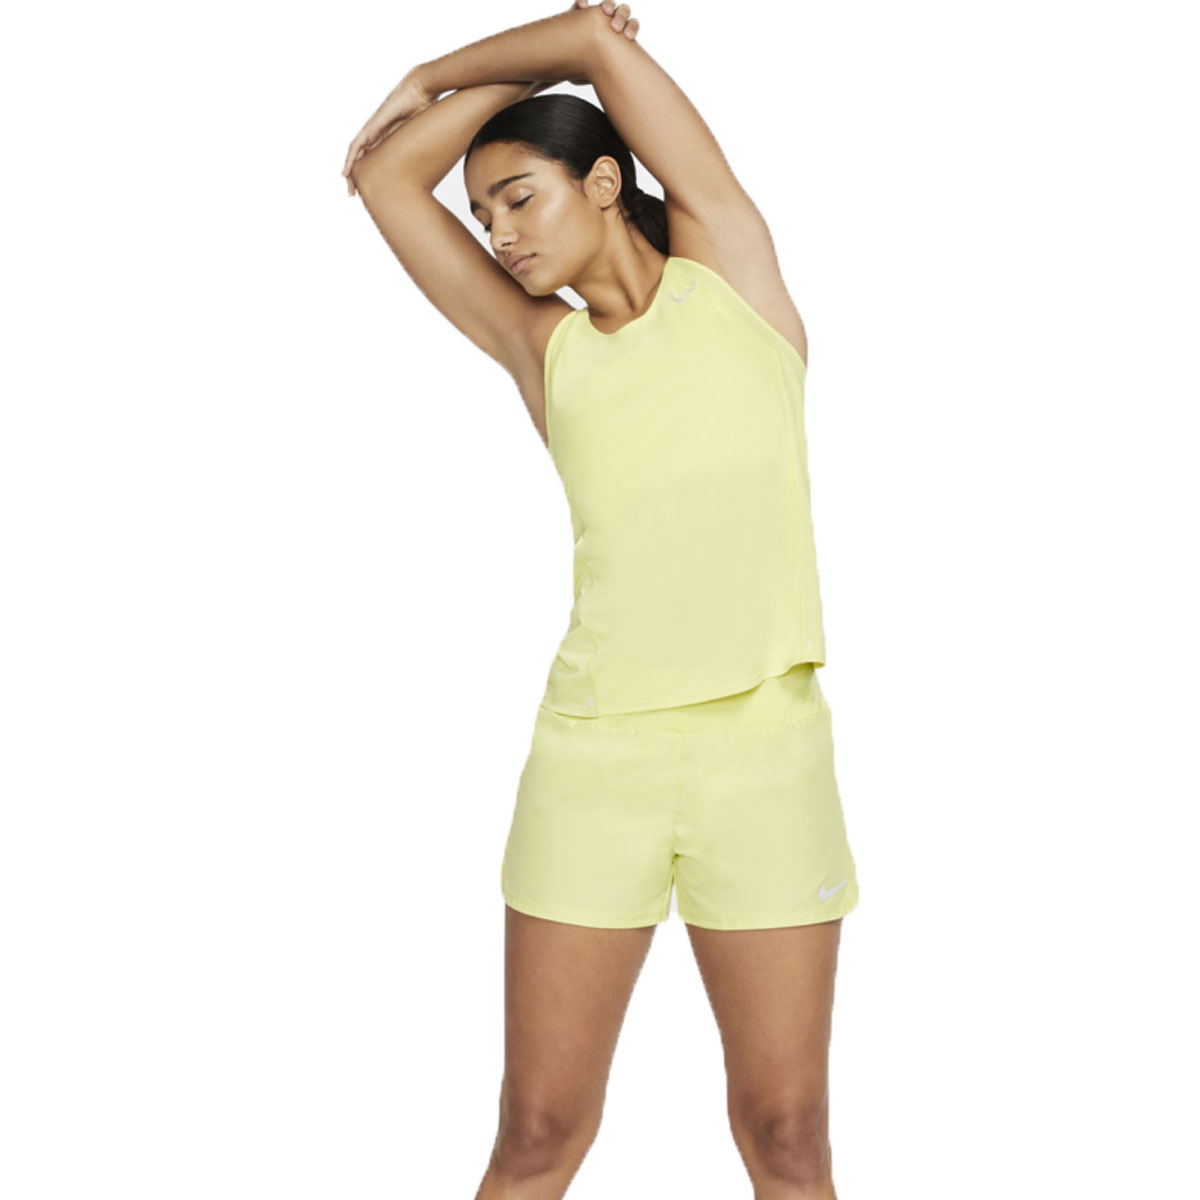 Women's Nike City Sleek Tank - Color: Limelight/Reflective - Size: S, Limelight/Reflective, large, image 2